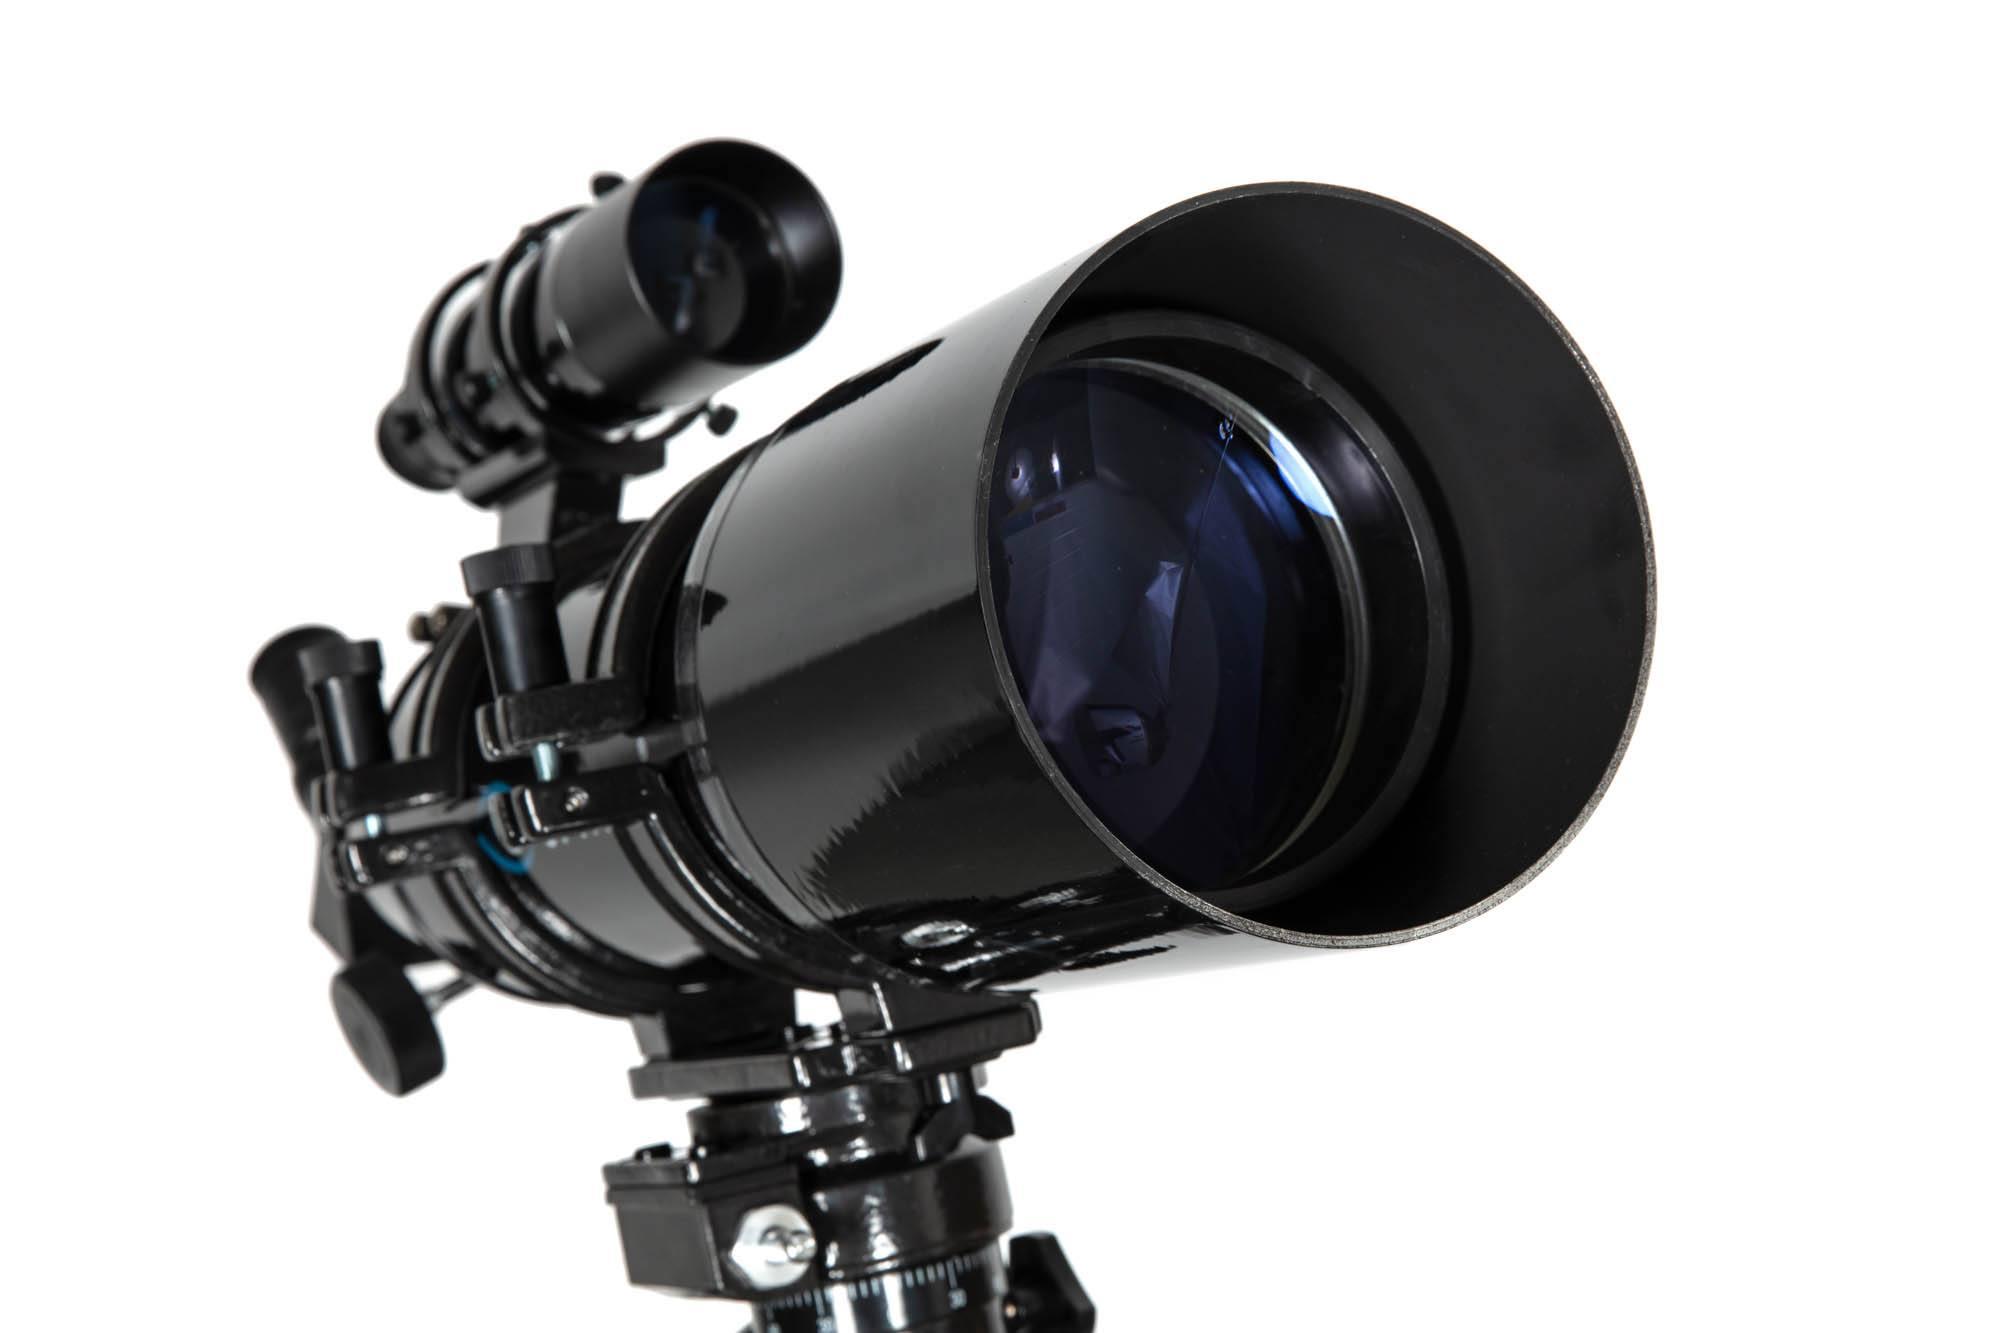 średnica obiektywu teleskopu space traveler od marki Opticon